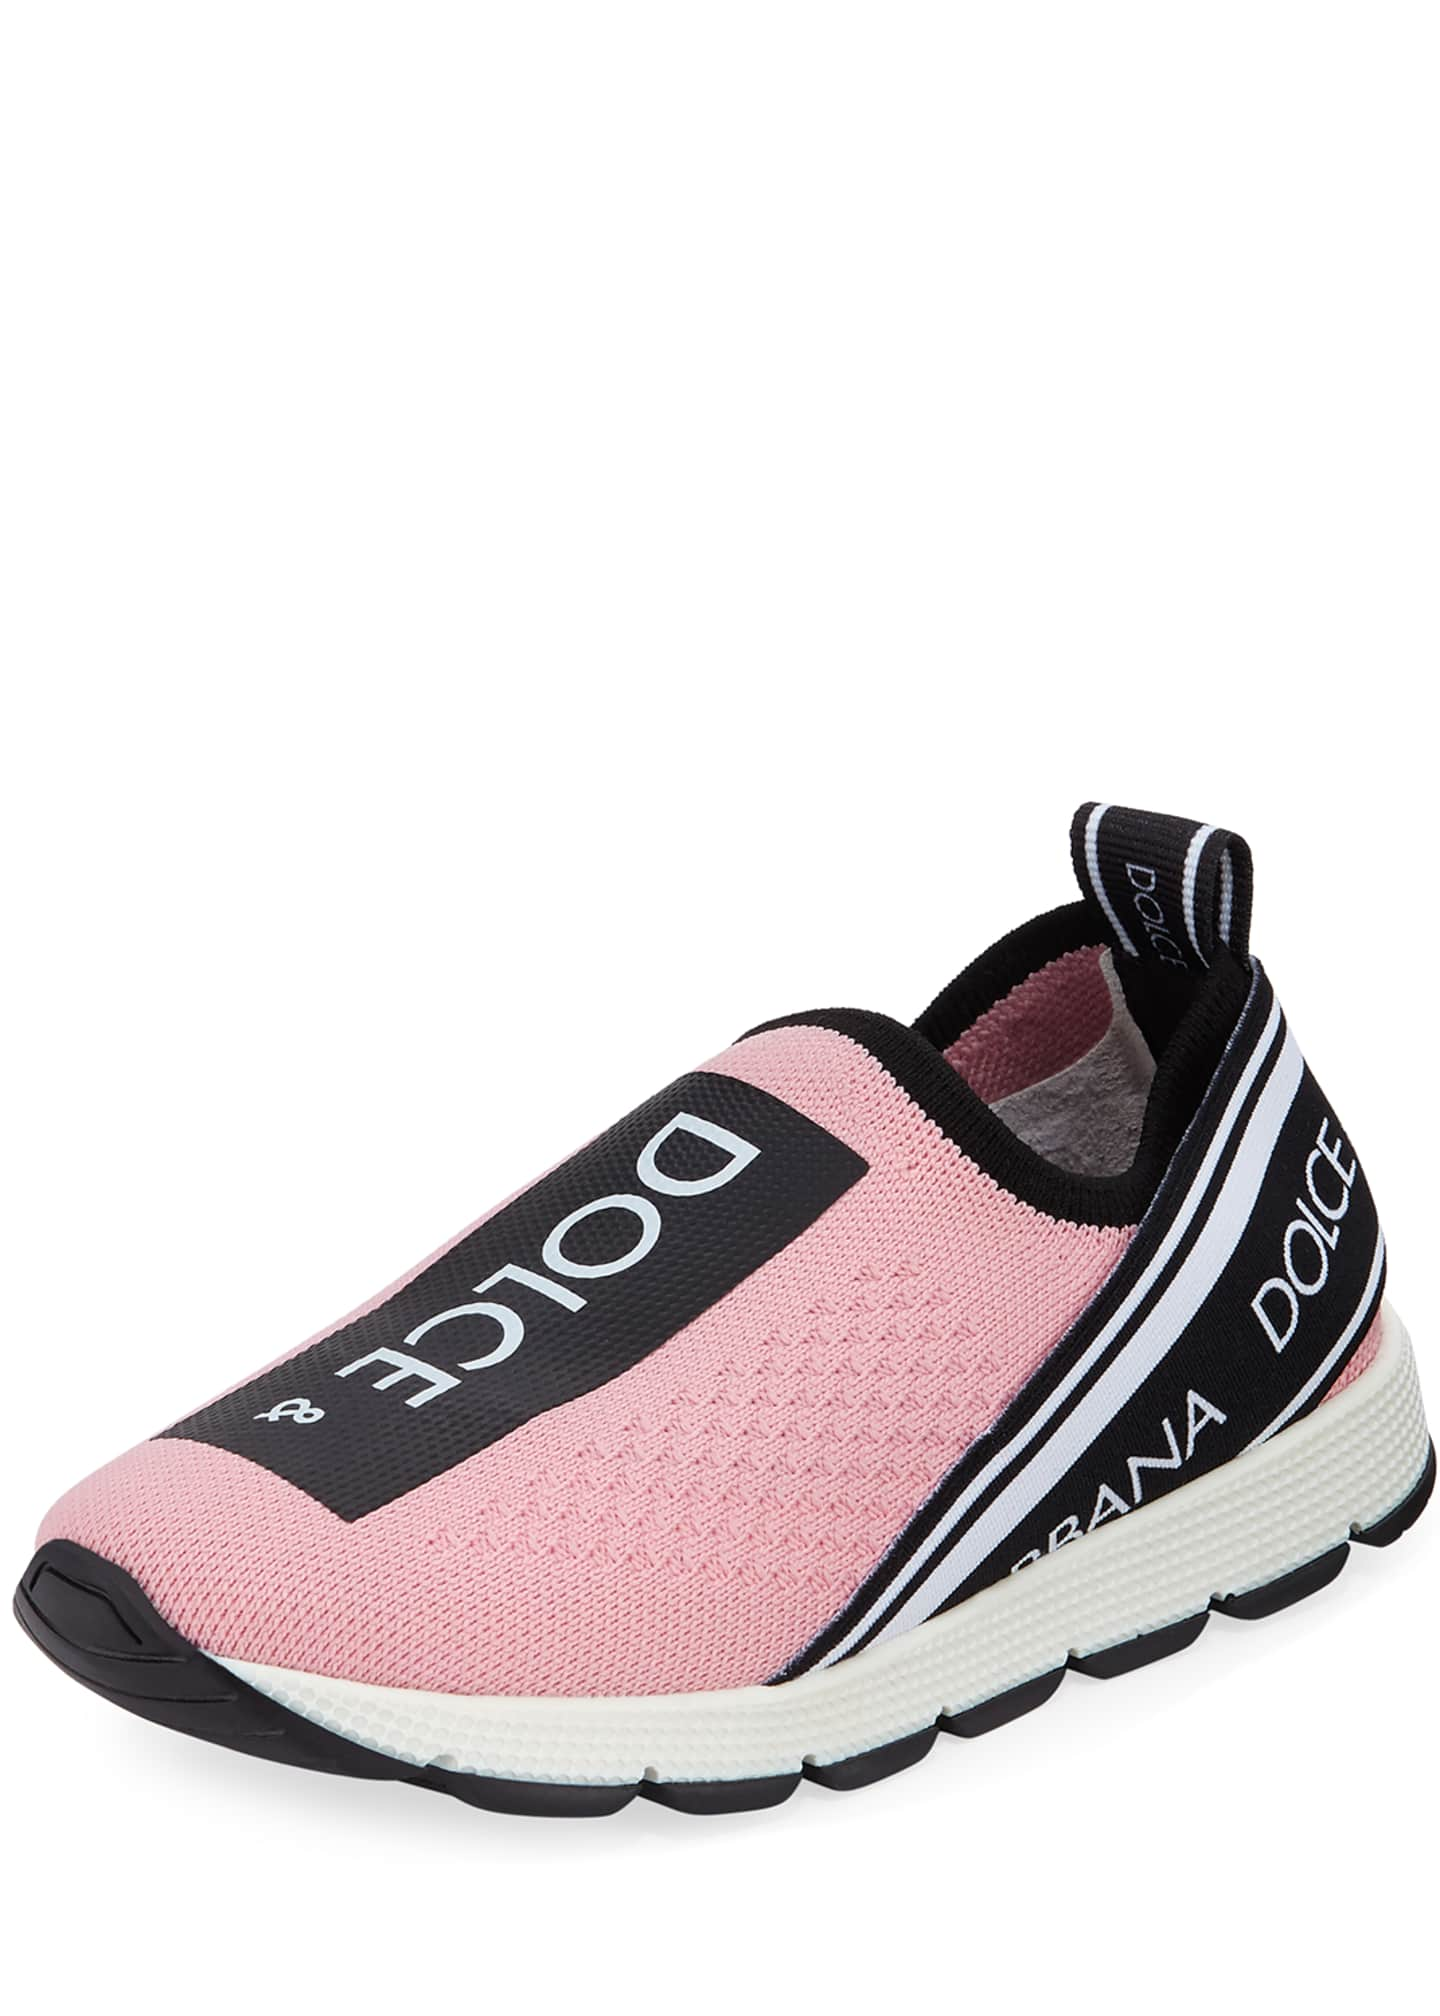 Dolce & Gabbana Maglina Slip-On Knit Logo Sneakers,